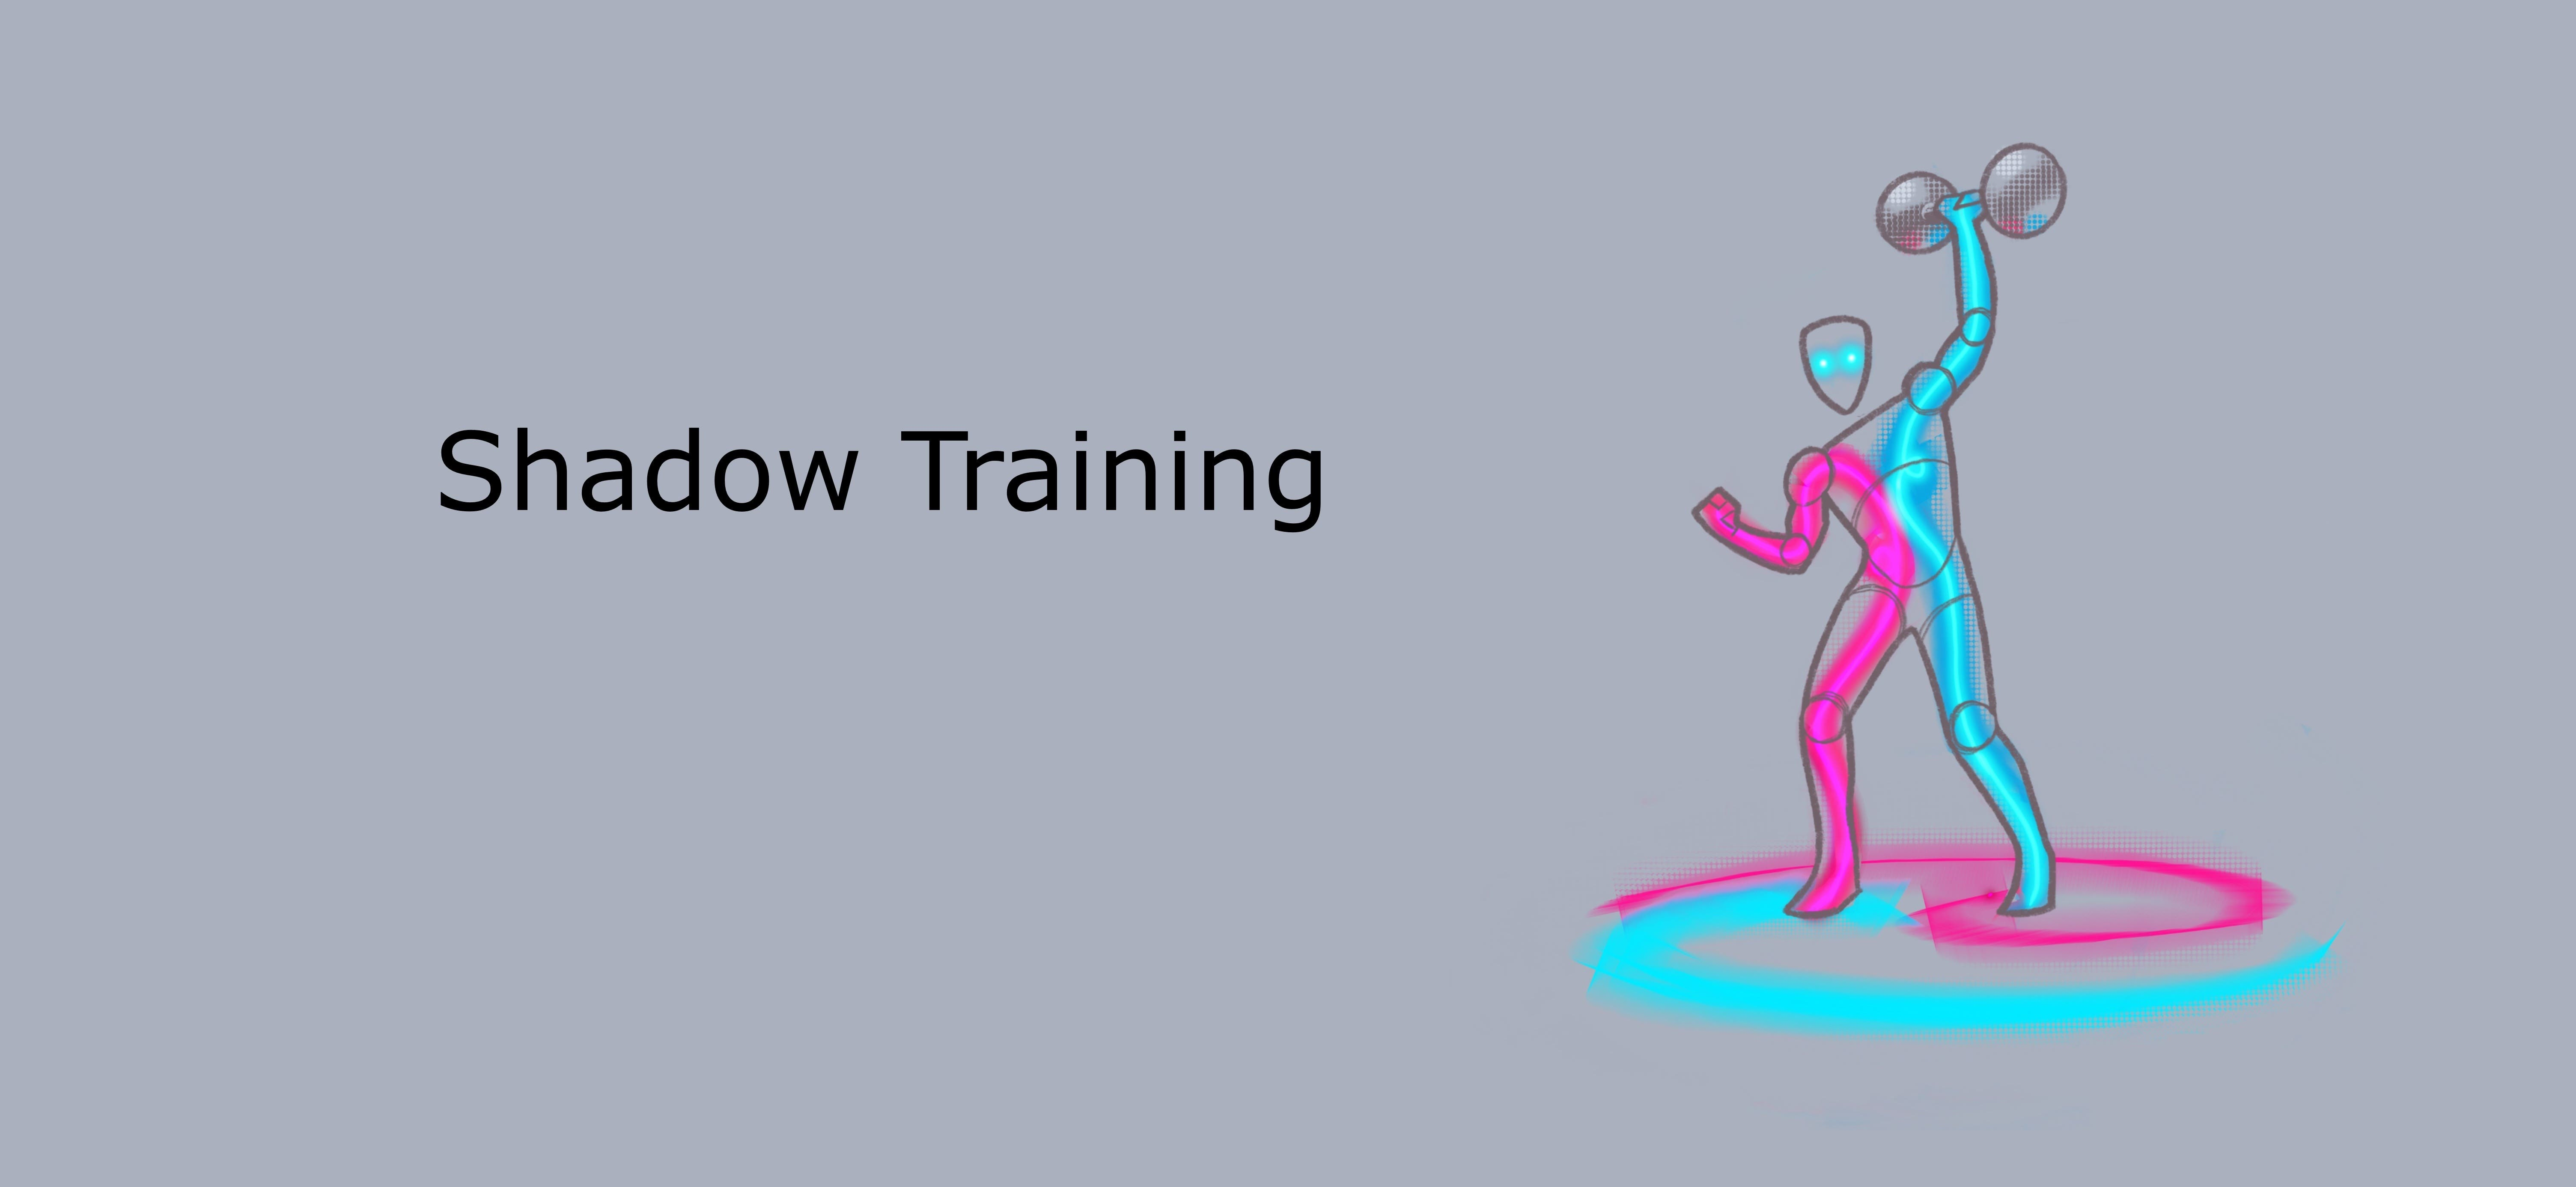 Shadow Training